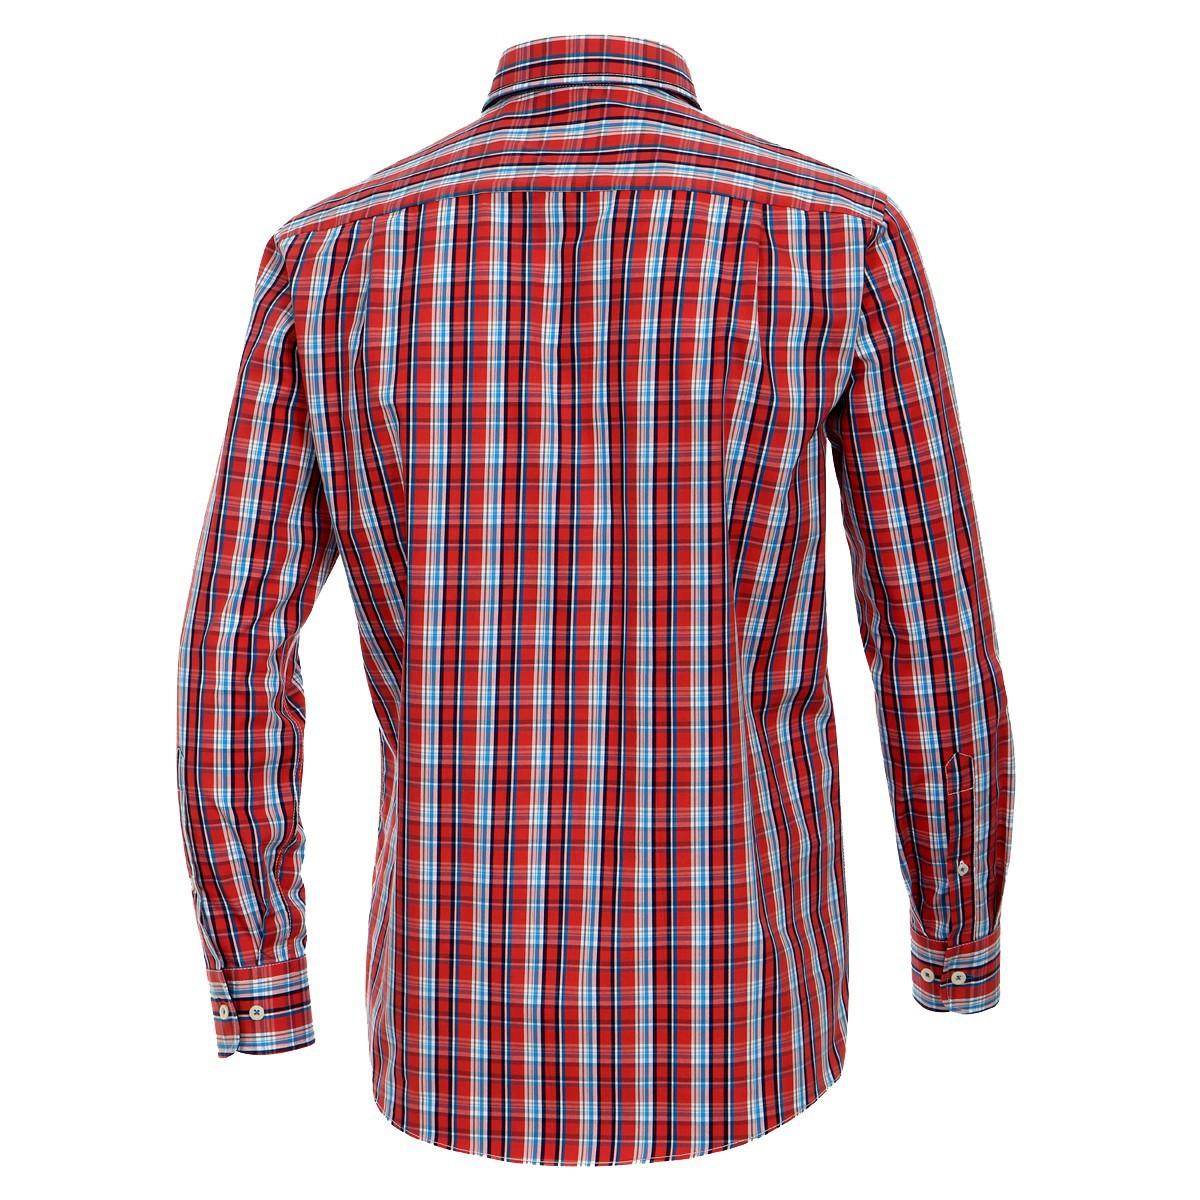 100% authentic 6bbf5 429e1 Herrenhemd langarm rot blau kariert von Casa Moda